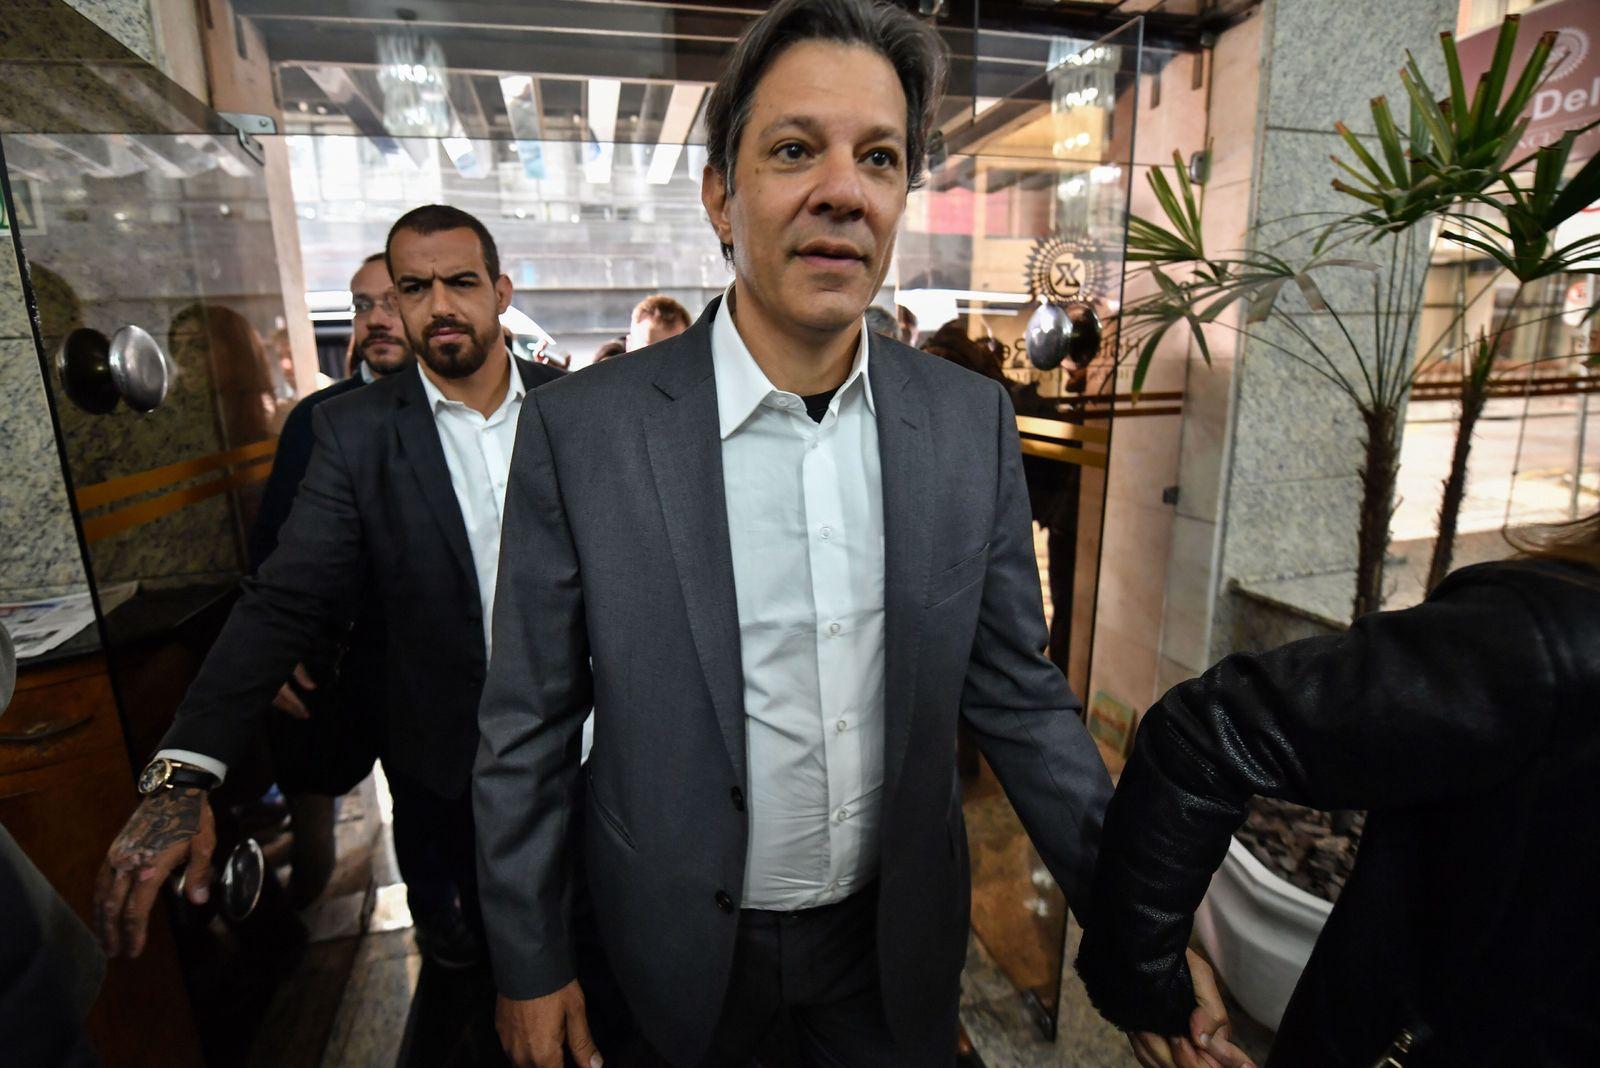 BRAZIL-POLITICS-ELECTION-LULA-HADDAD